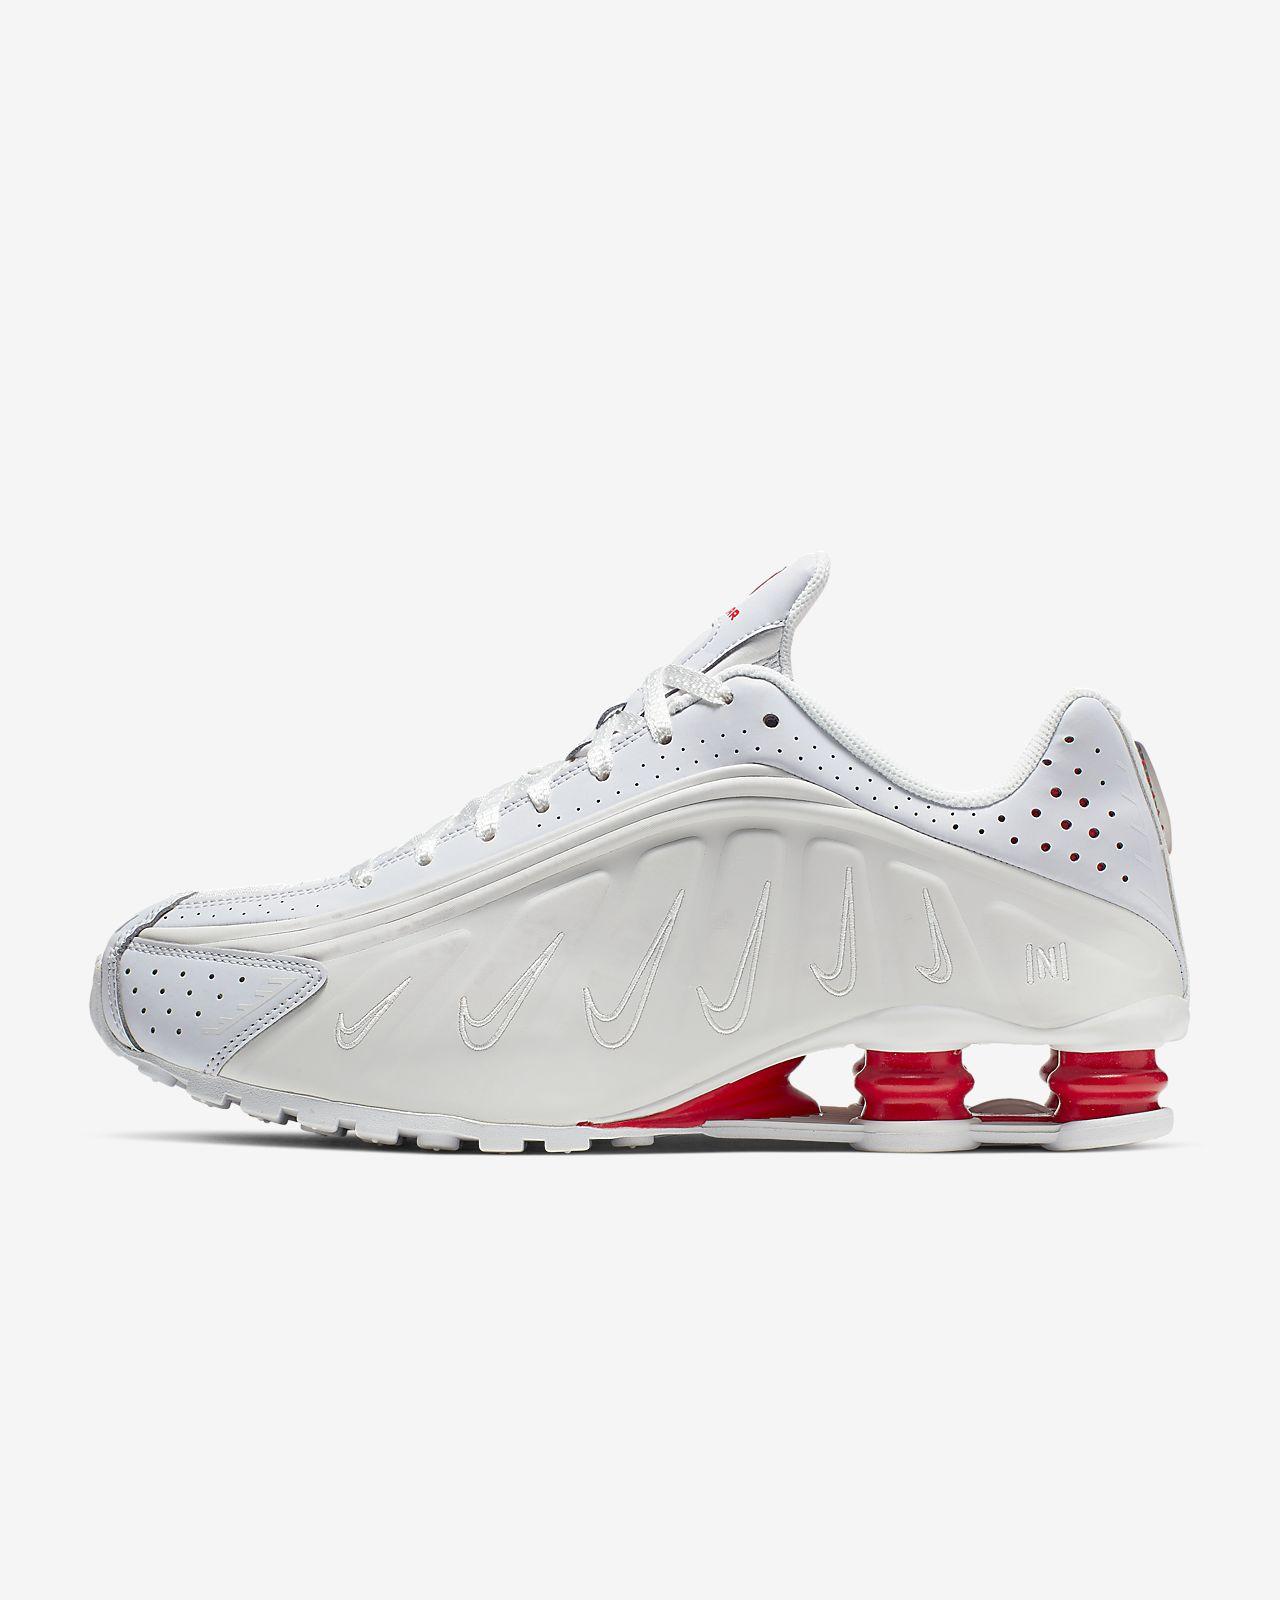 Nike Shox R4 Neymar Jr. Shoe